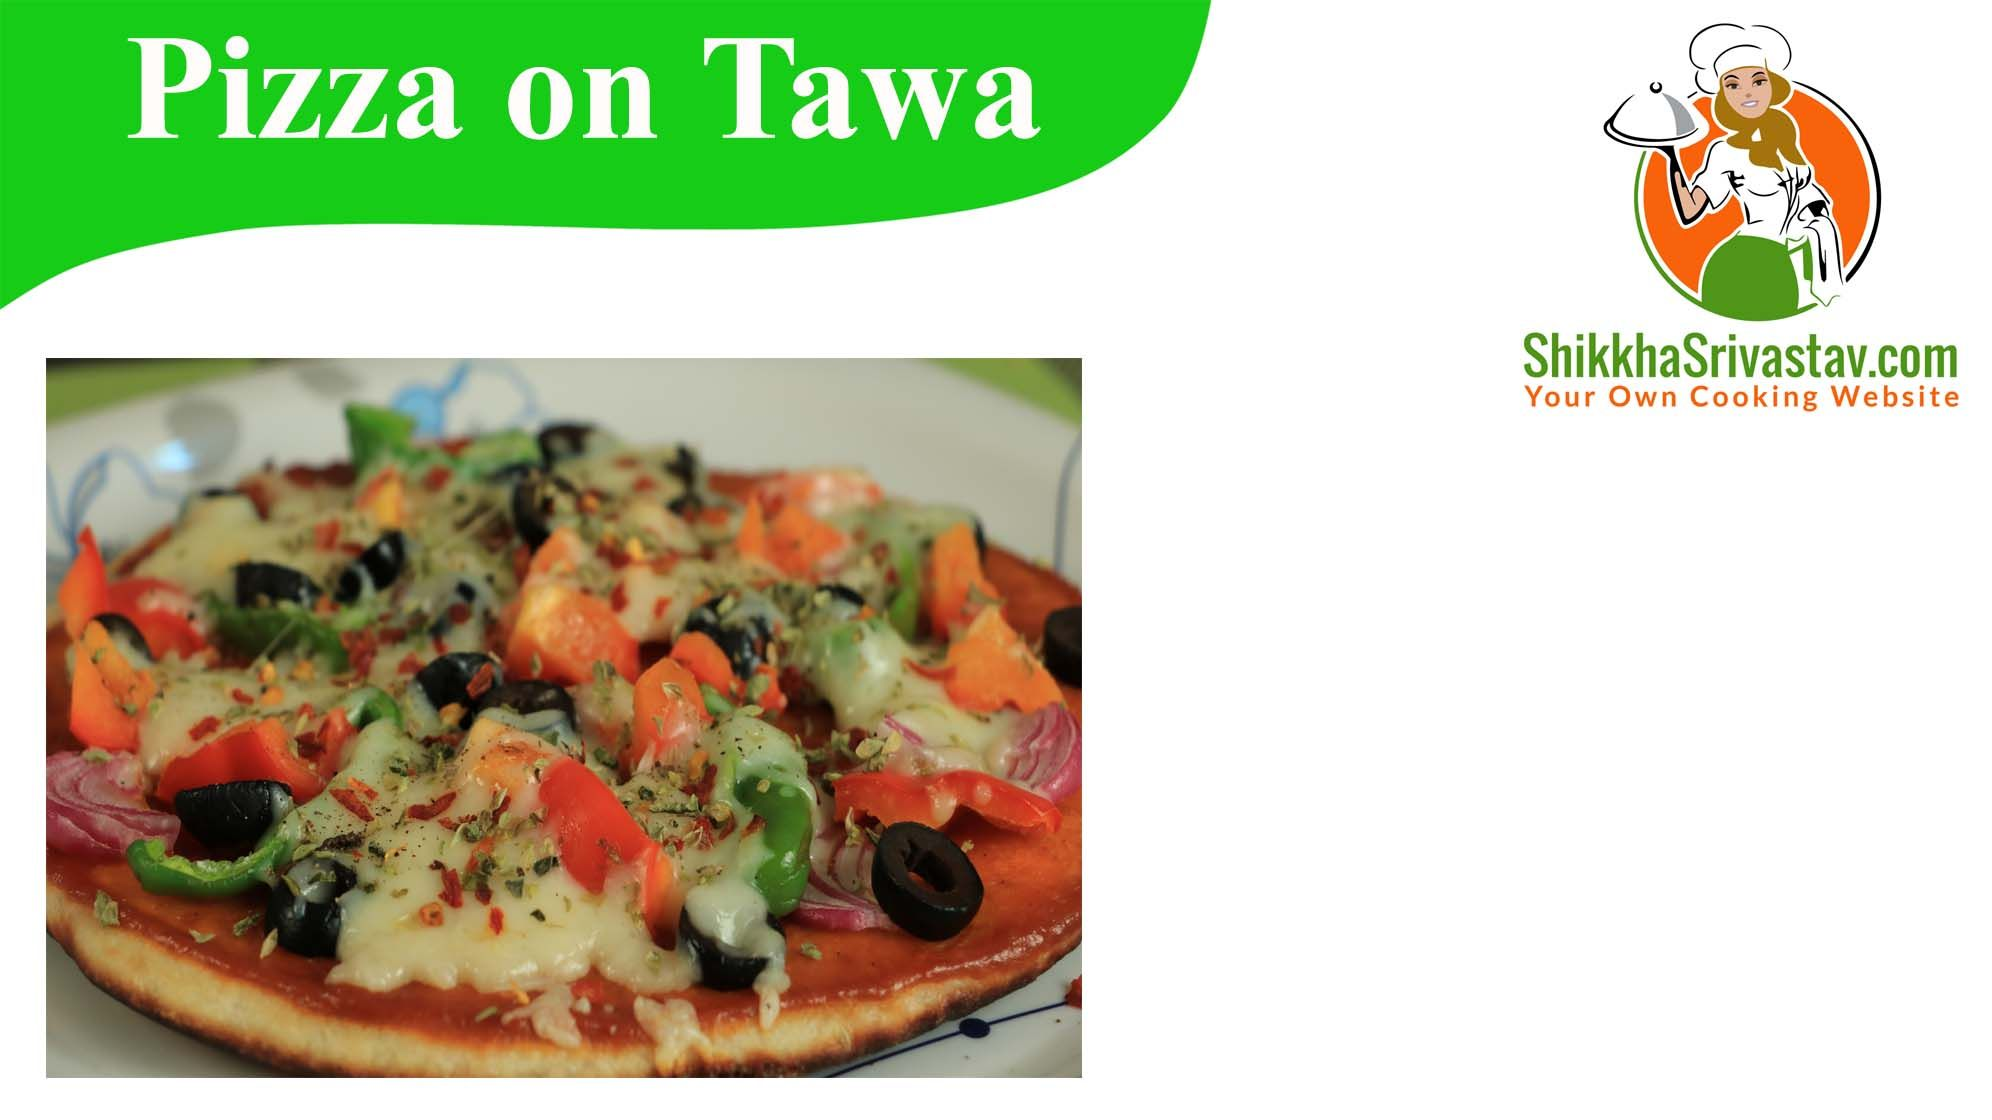 Tawa pizza recipe in hindi how to make tawa pizza at home in tawa pizza recipe in hindi how to make tawa pizza at home in hindi language forumfinder Image collections